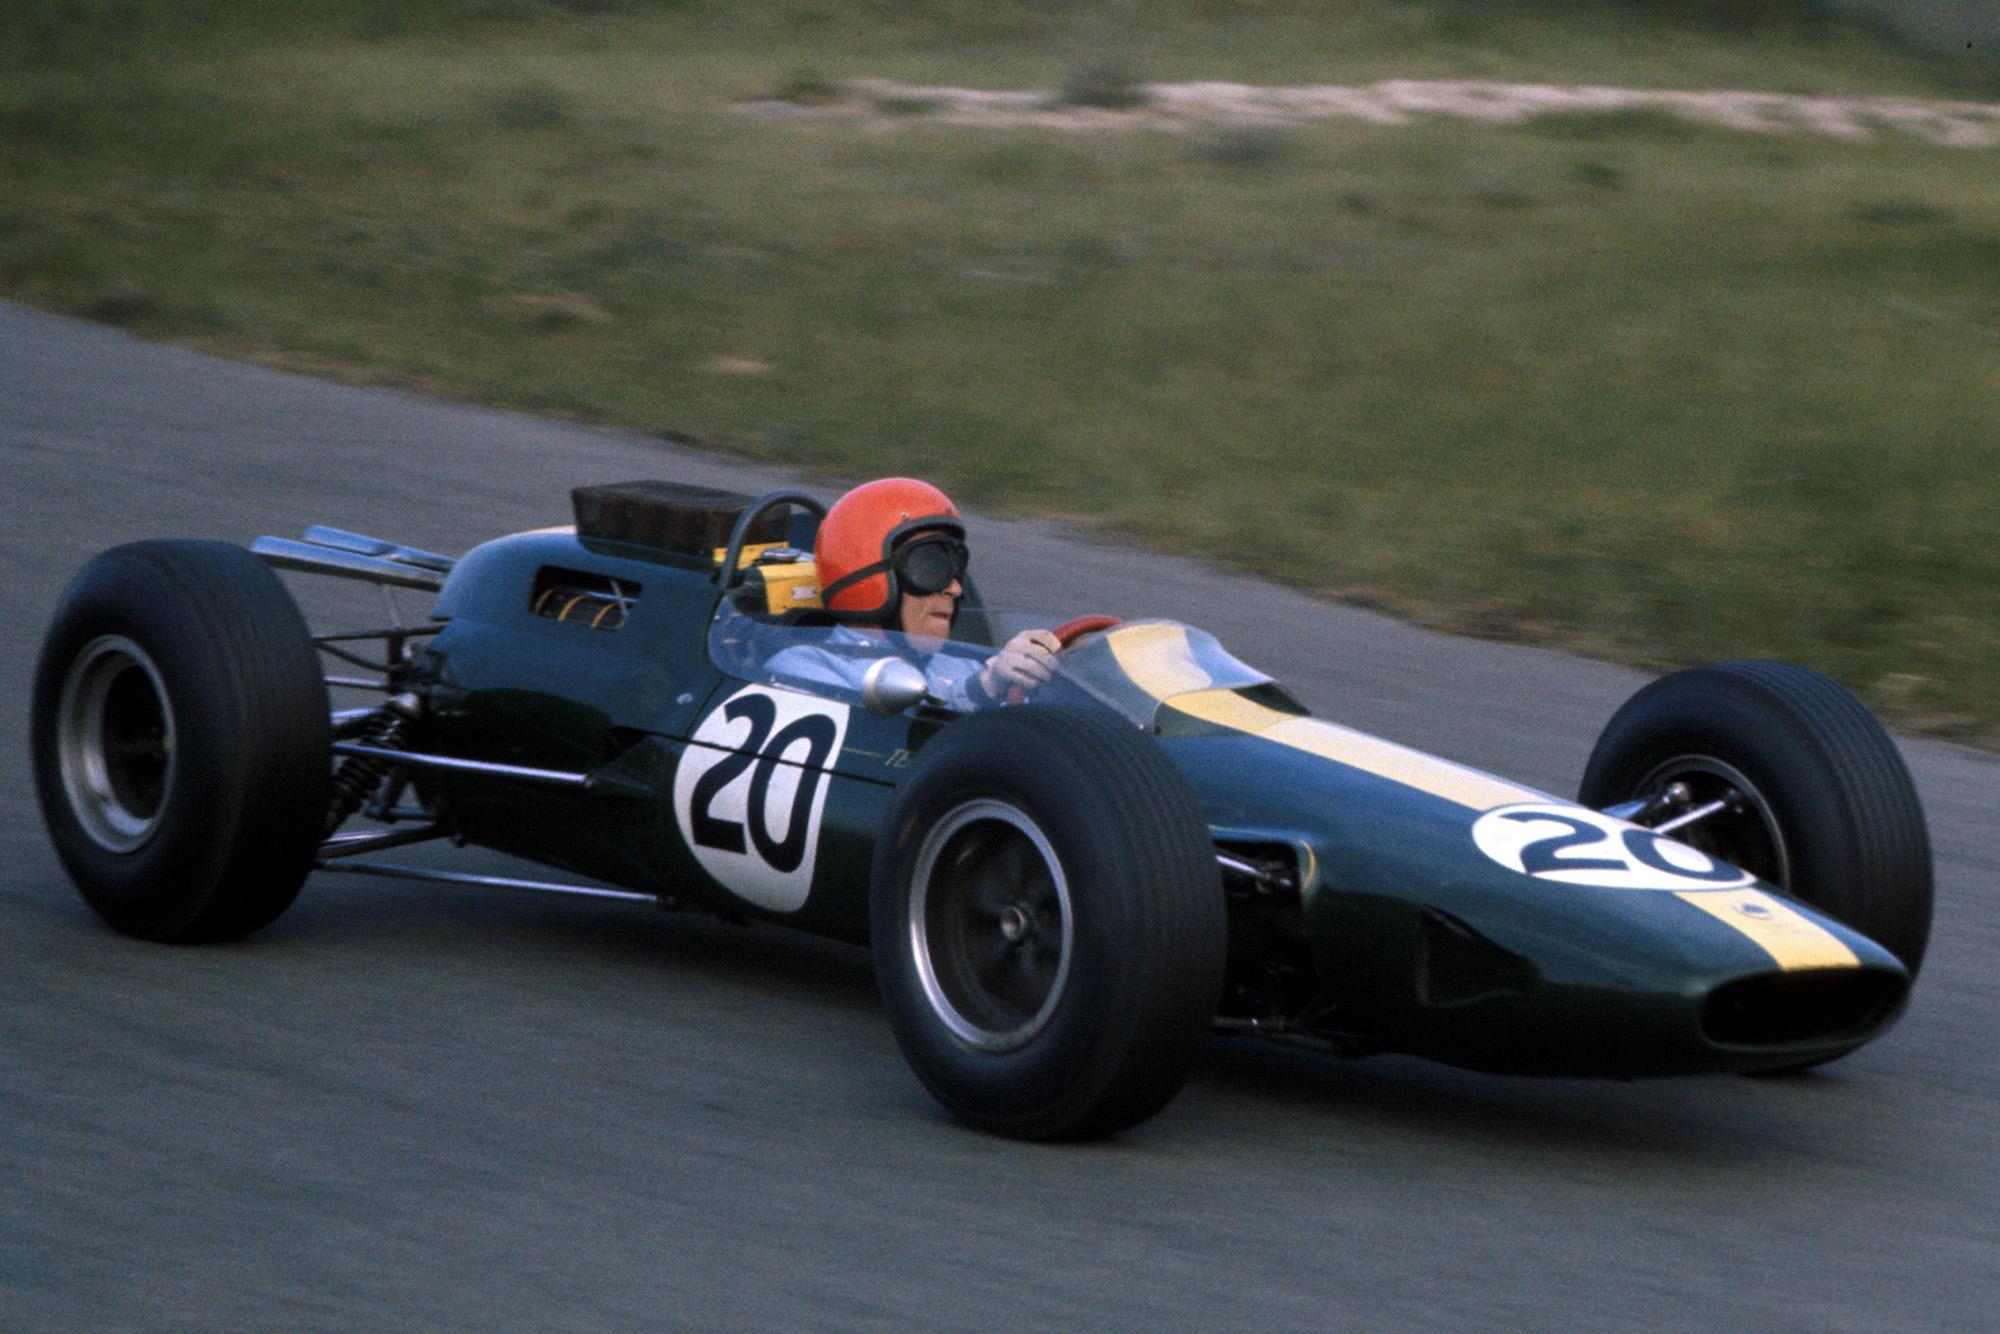 eter Arundell (GBR) Lotus 25.